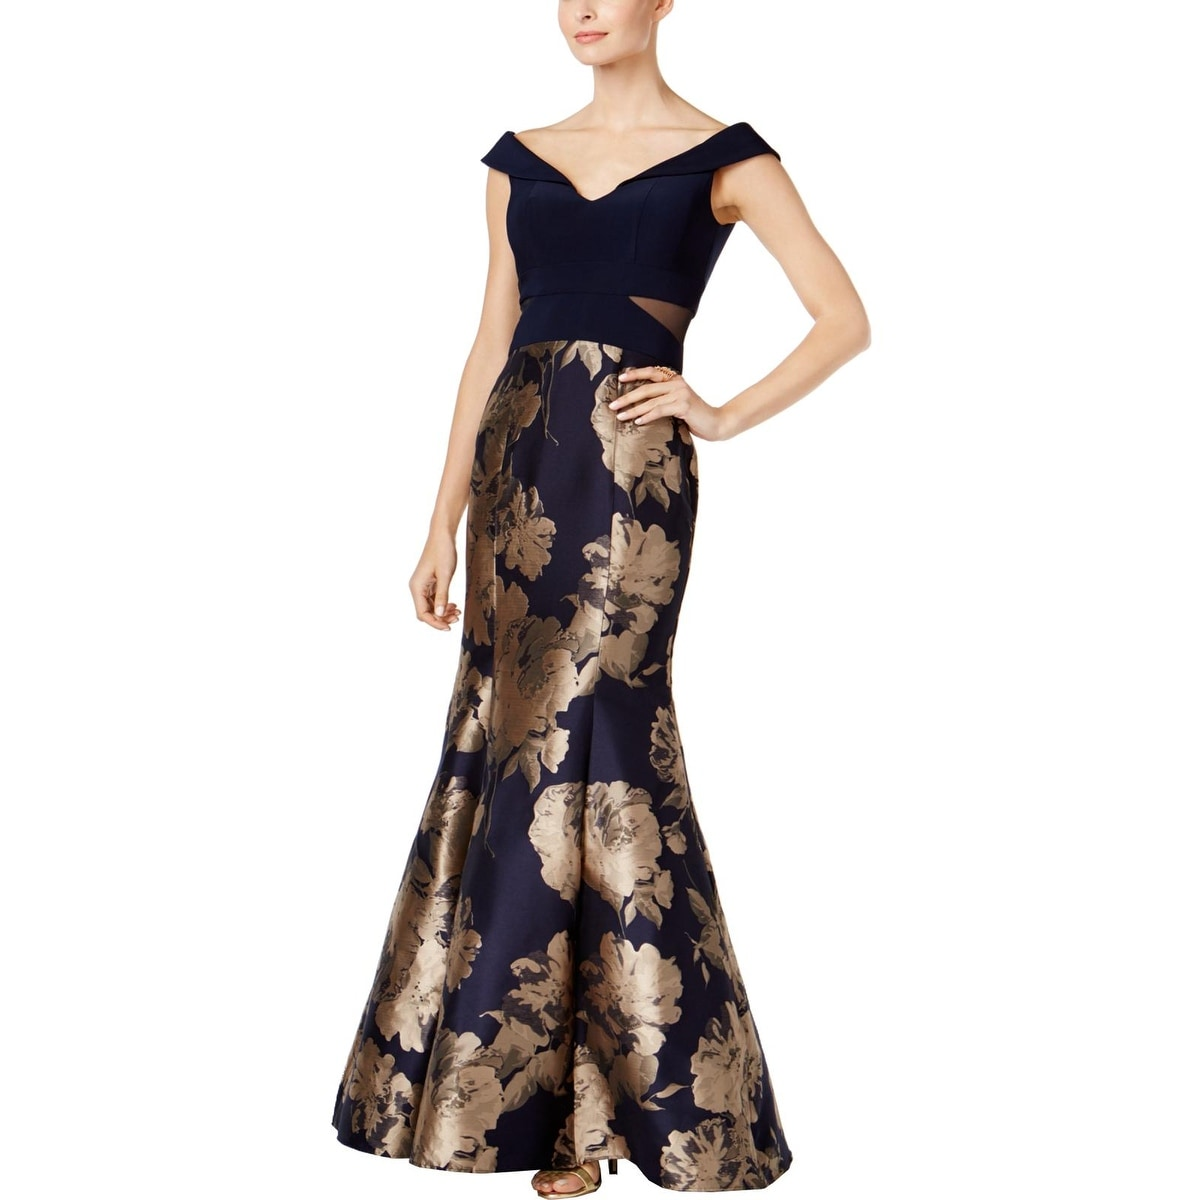 c72093e02208 Xscape Dresses